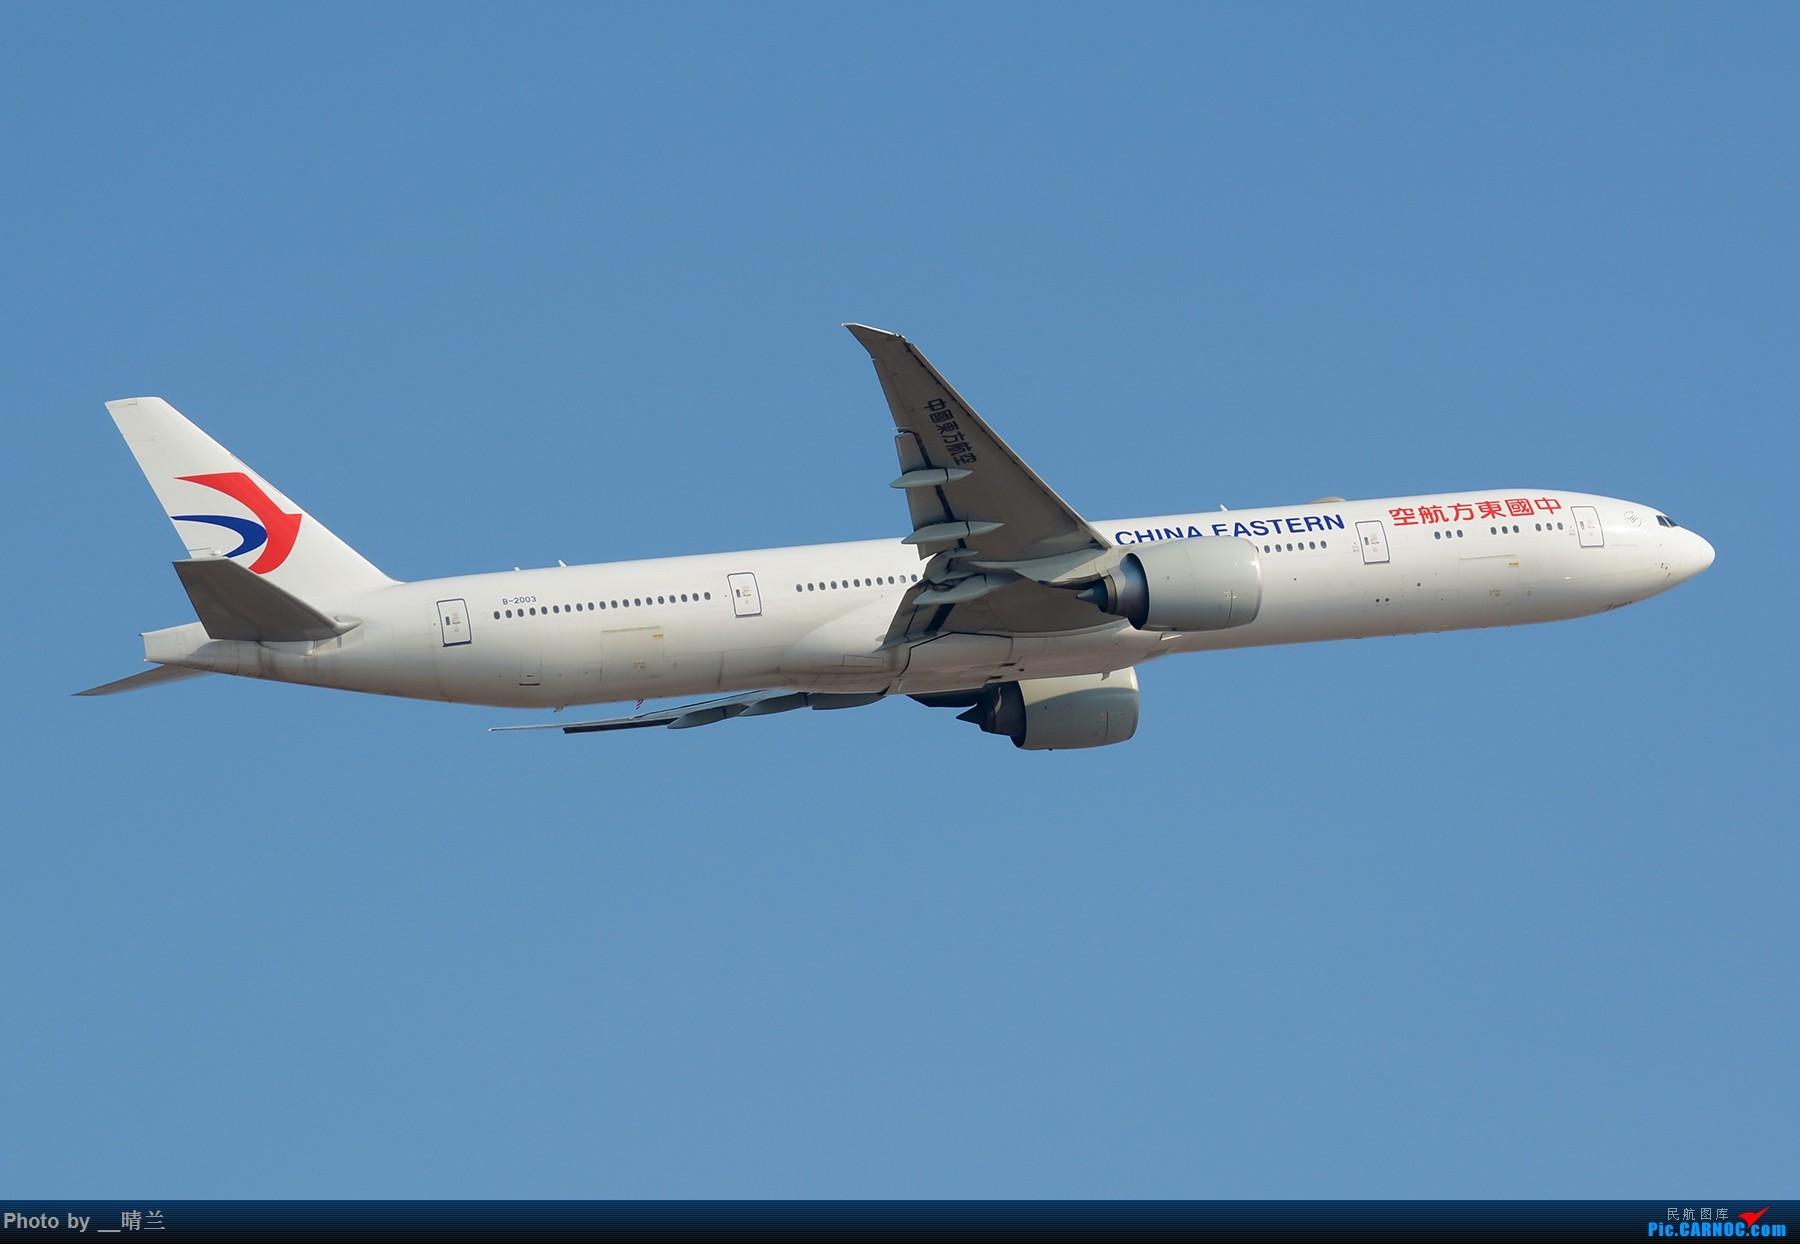 Re:[原创]【PVG】大年初二 新角度解锁 集齐7只77W 召唤748一枚!#祝各位飞友新的一年一飞冲天!# BOEING 777-300ER B-2003 中国上海浦东国际机场